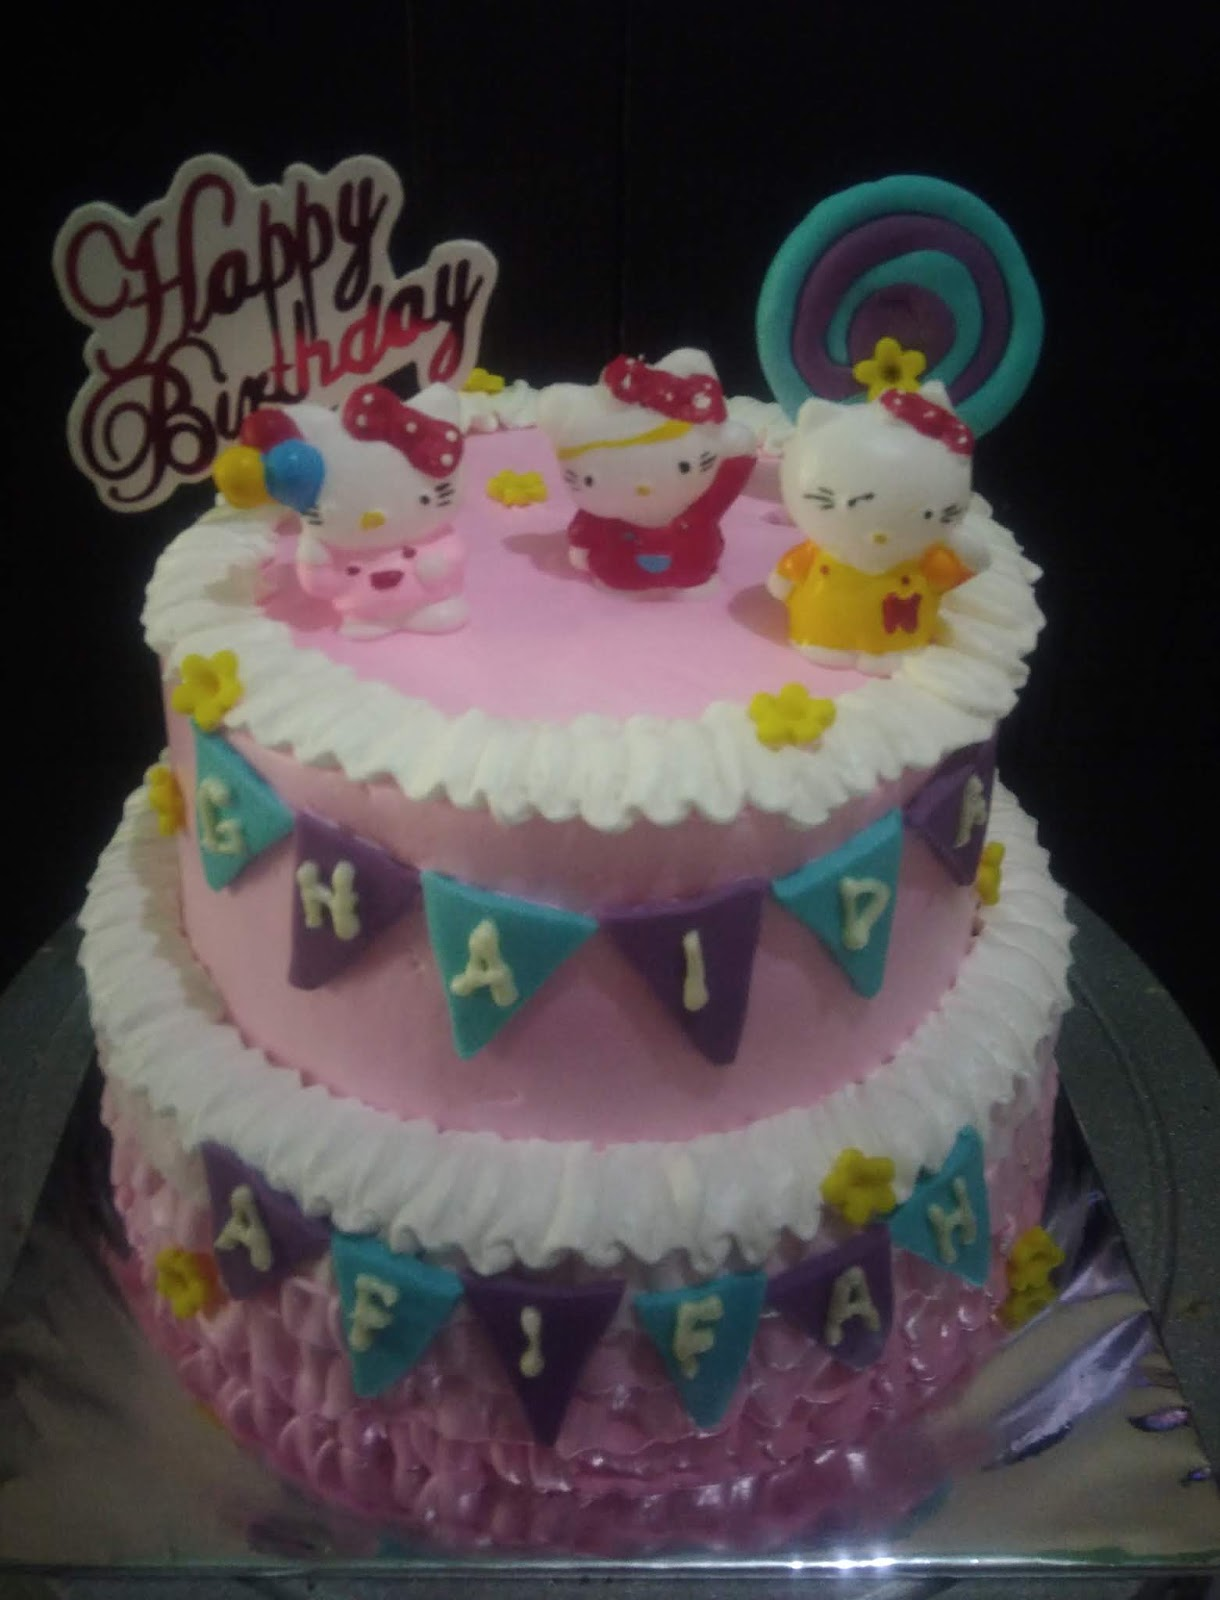 Aneka Kue Ulang Tahun Tingkat Atau Kue Pengantin Toko Kue